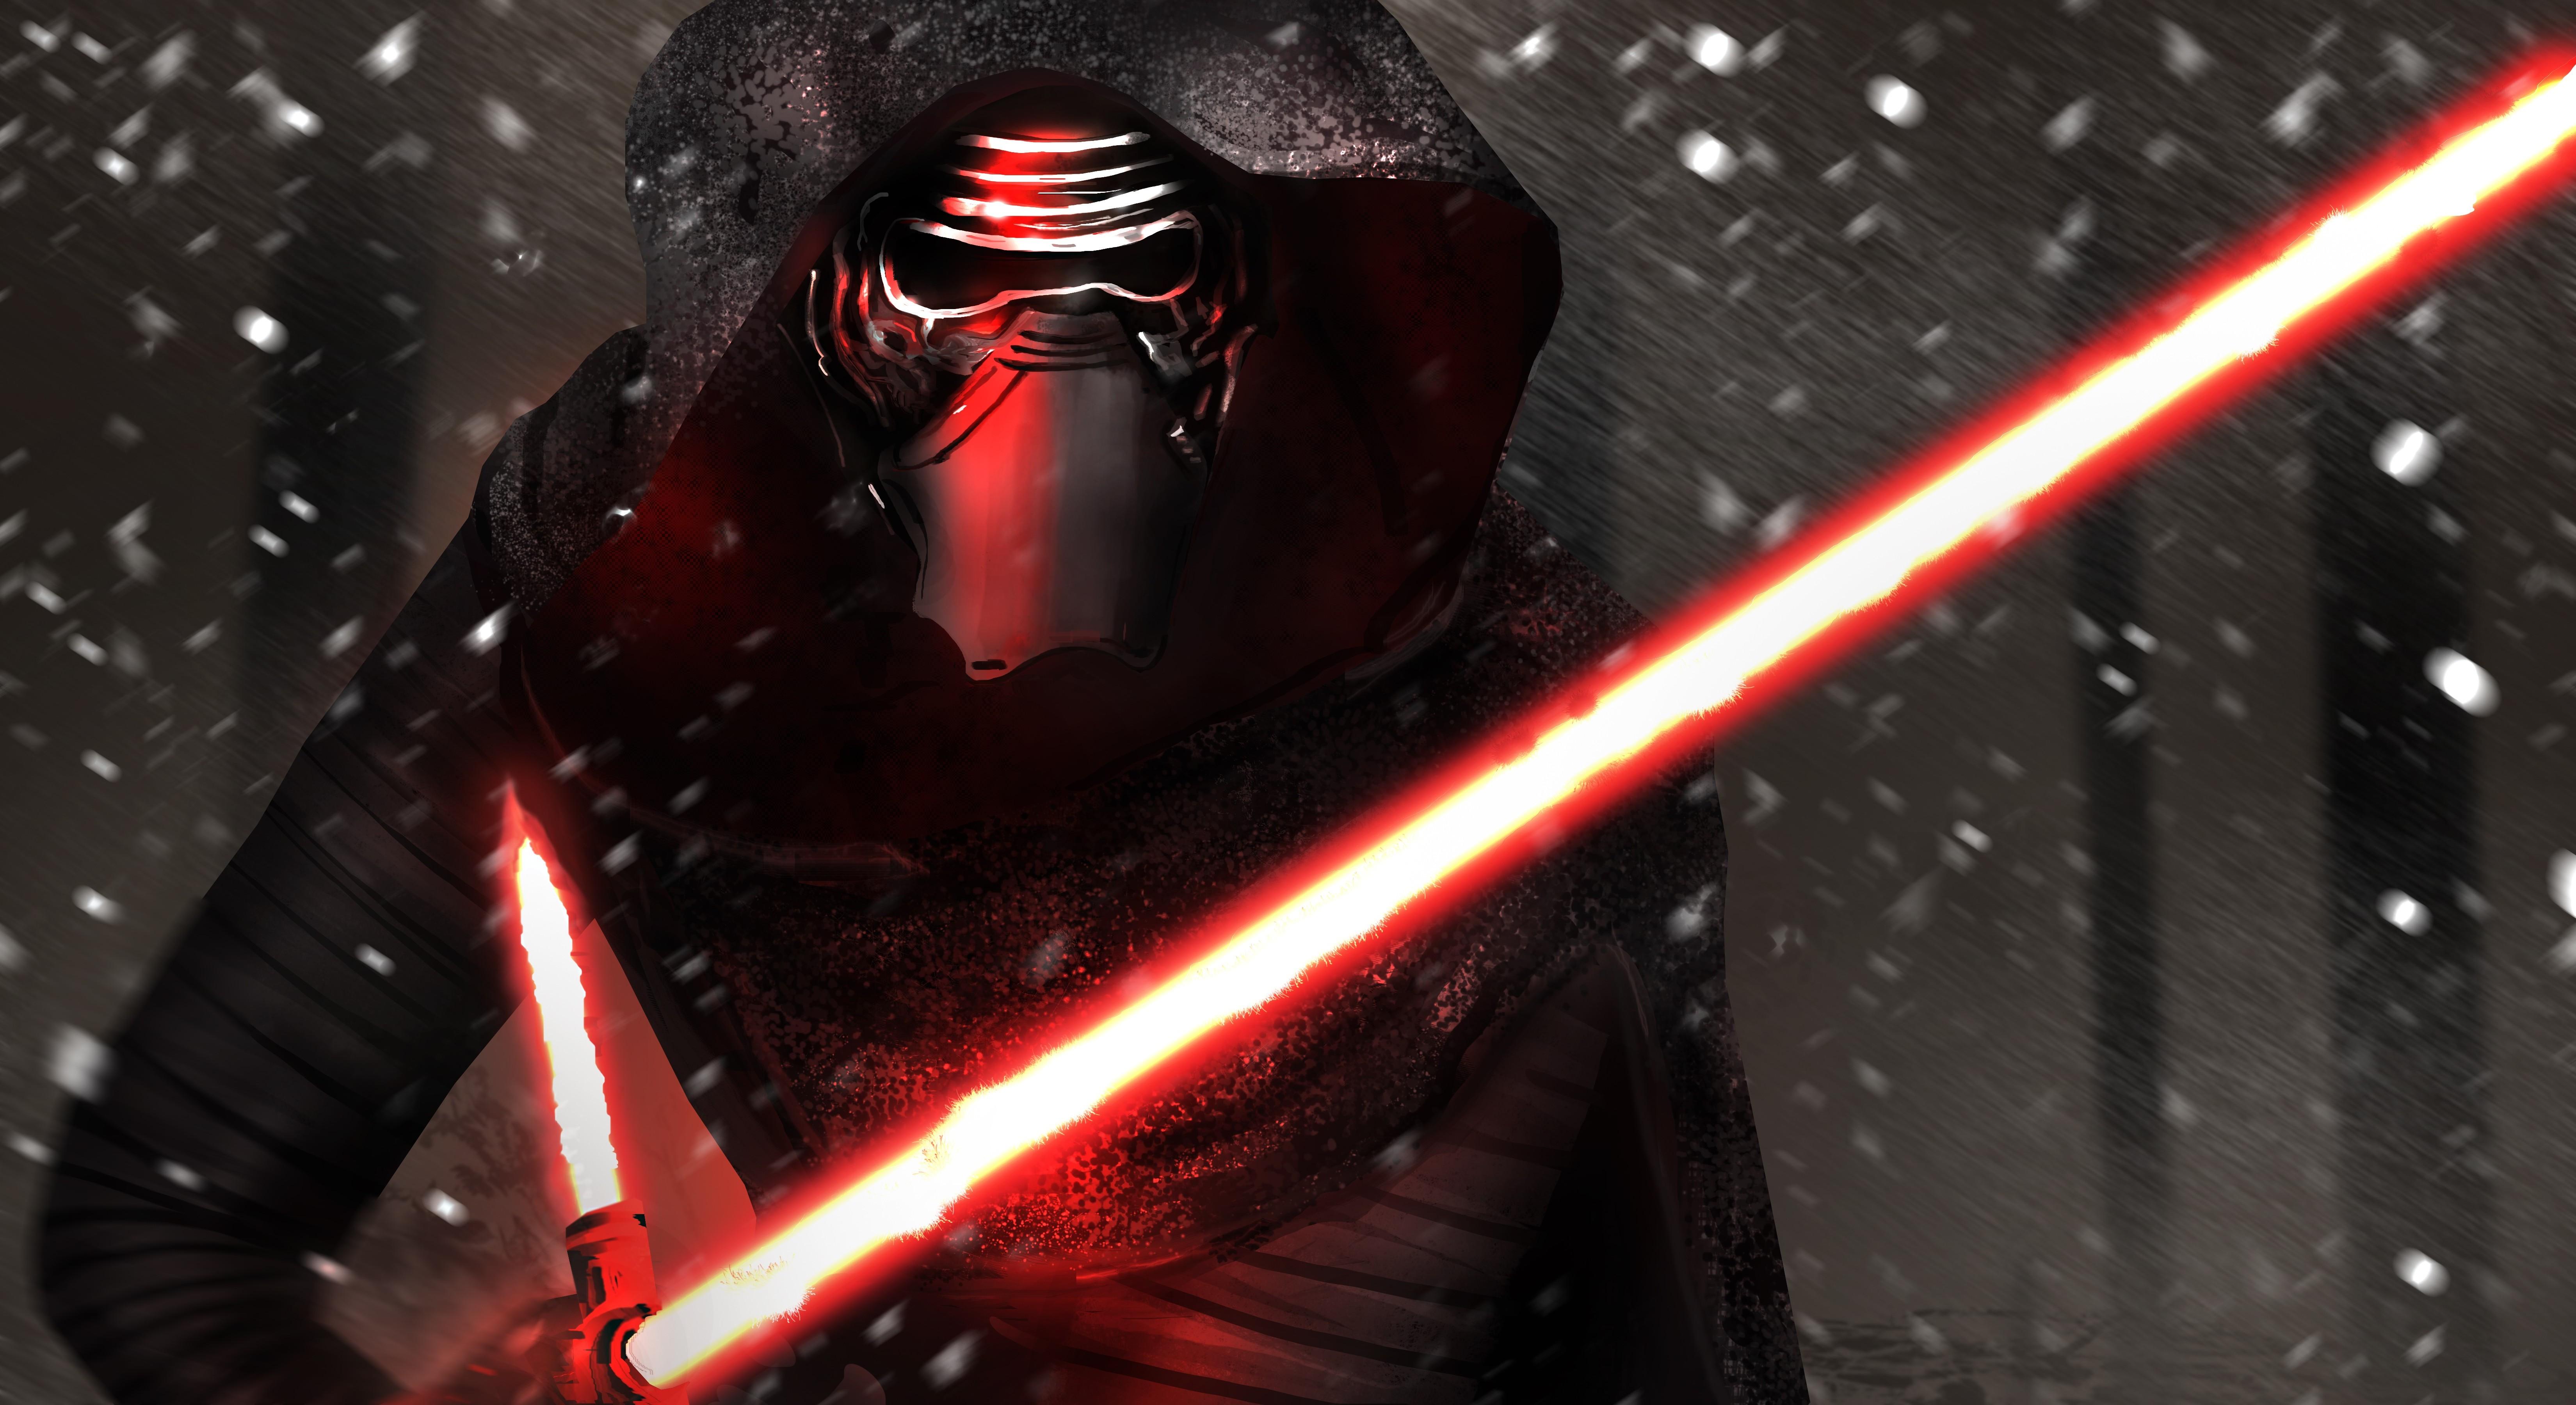 Star Wars Red Kylo Ren Darkness Screenshot Computer Wallpaper Fictional Character Special Effects 6600x3600 Px